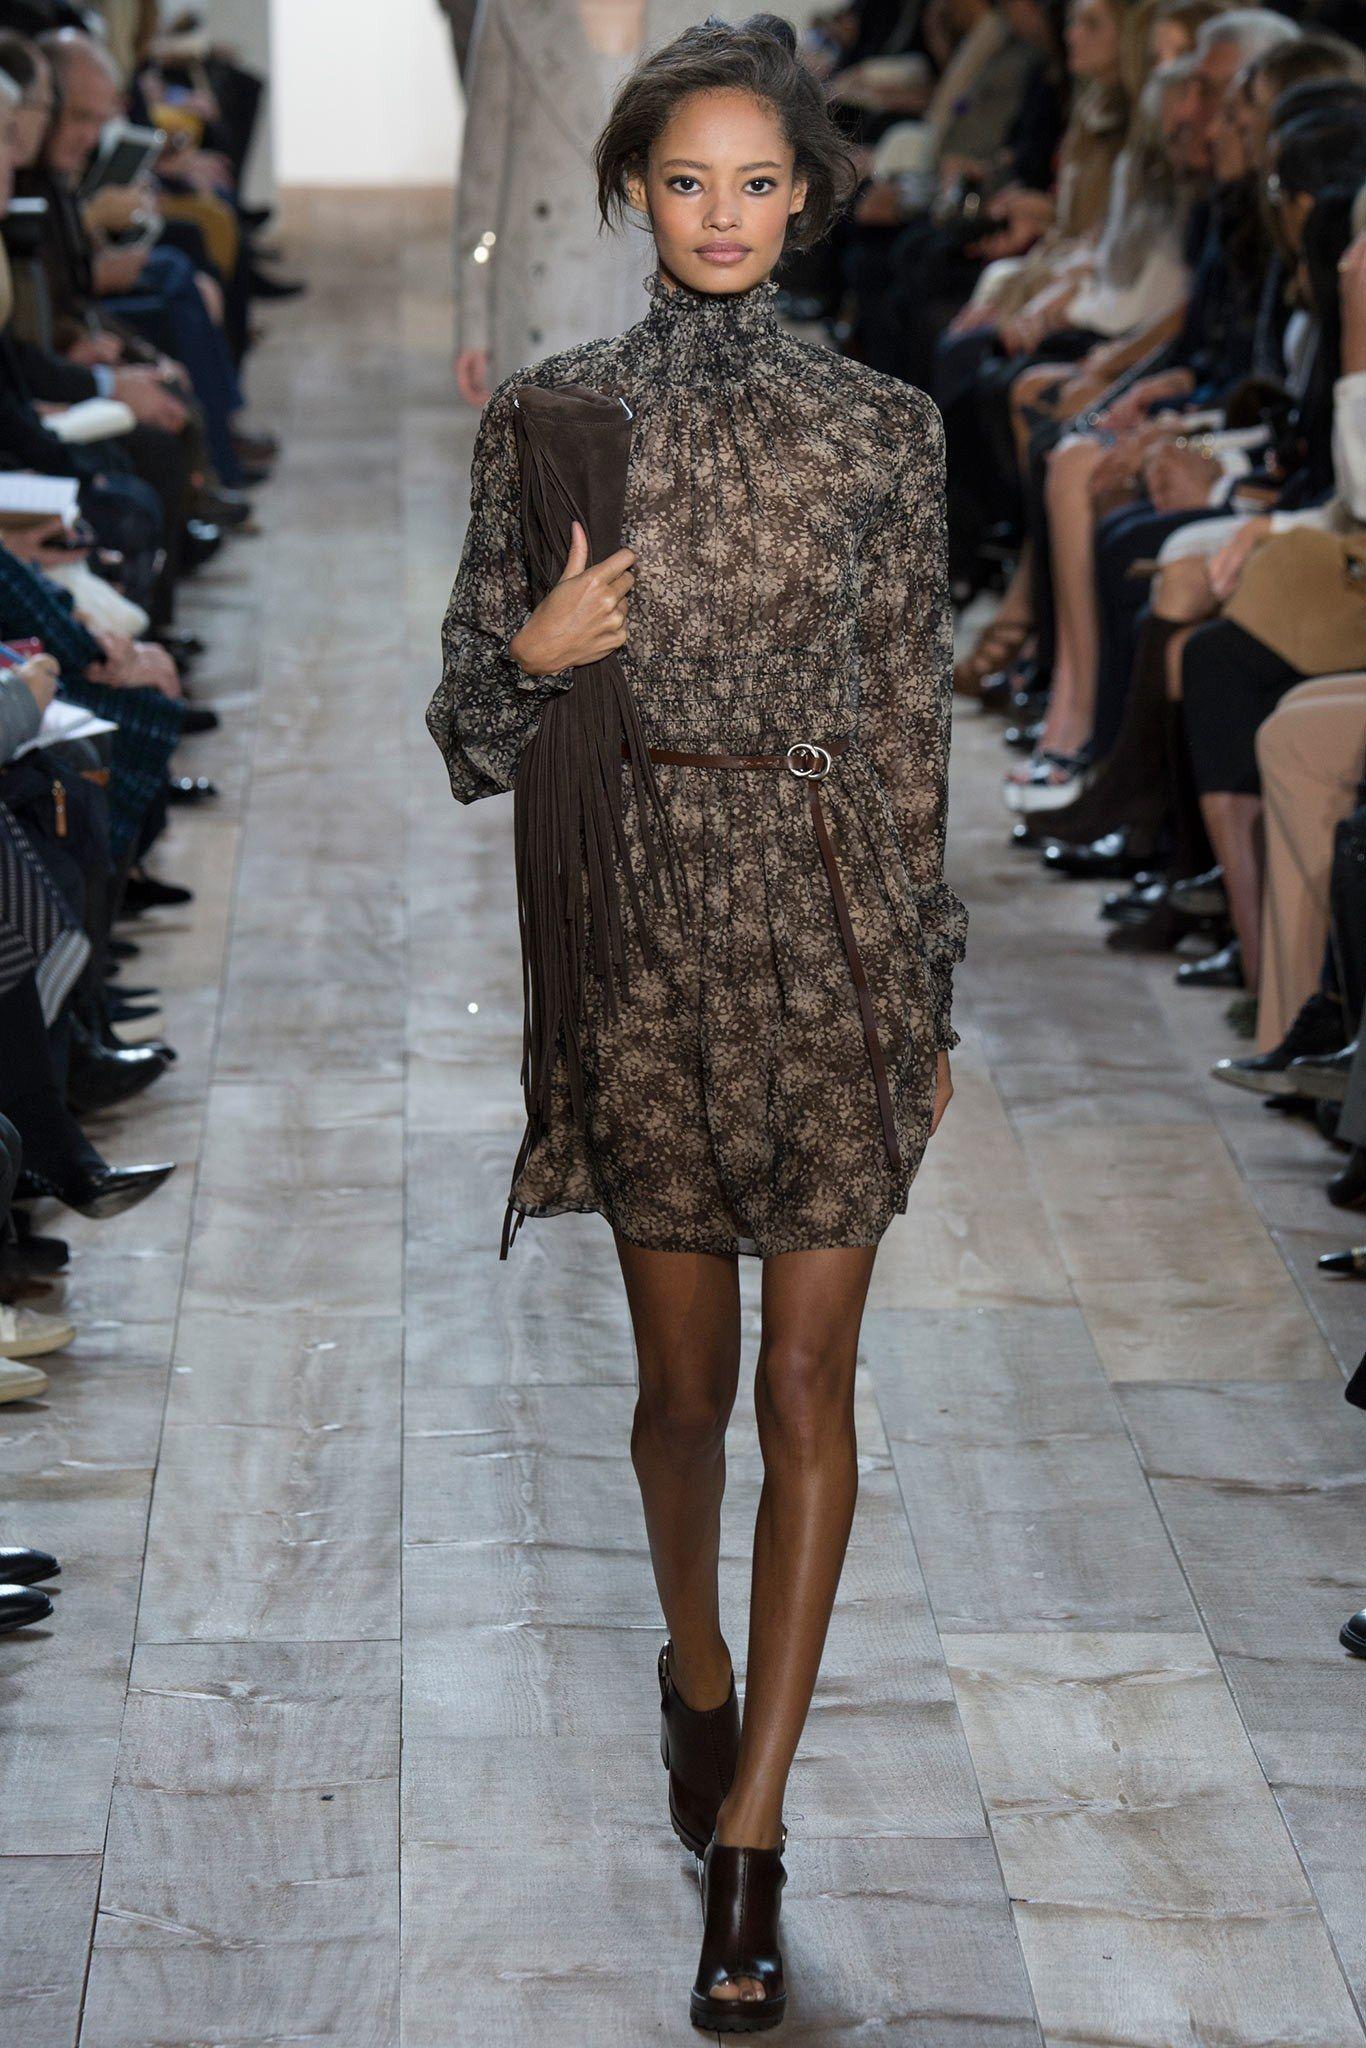 Michael Kors Collection Fall 2014 Ready-to-Wear Fashion Show - Malaika Firth